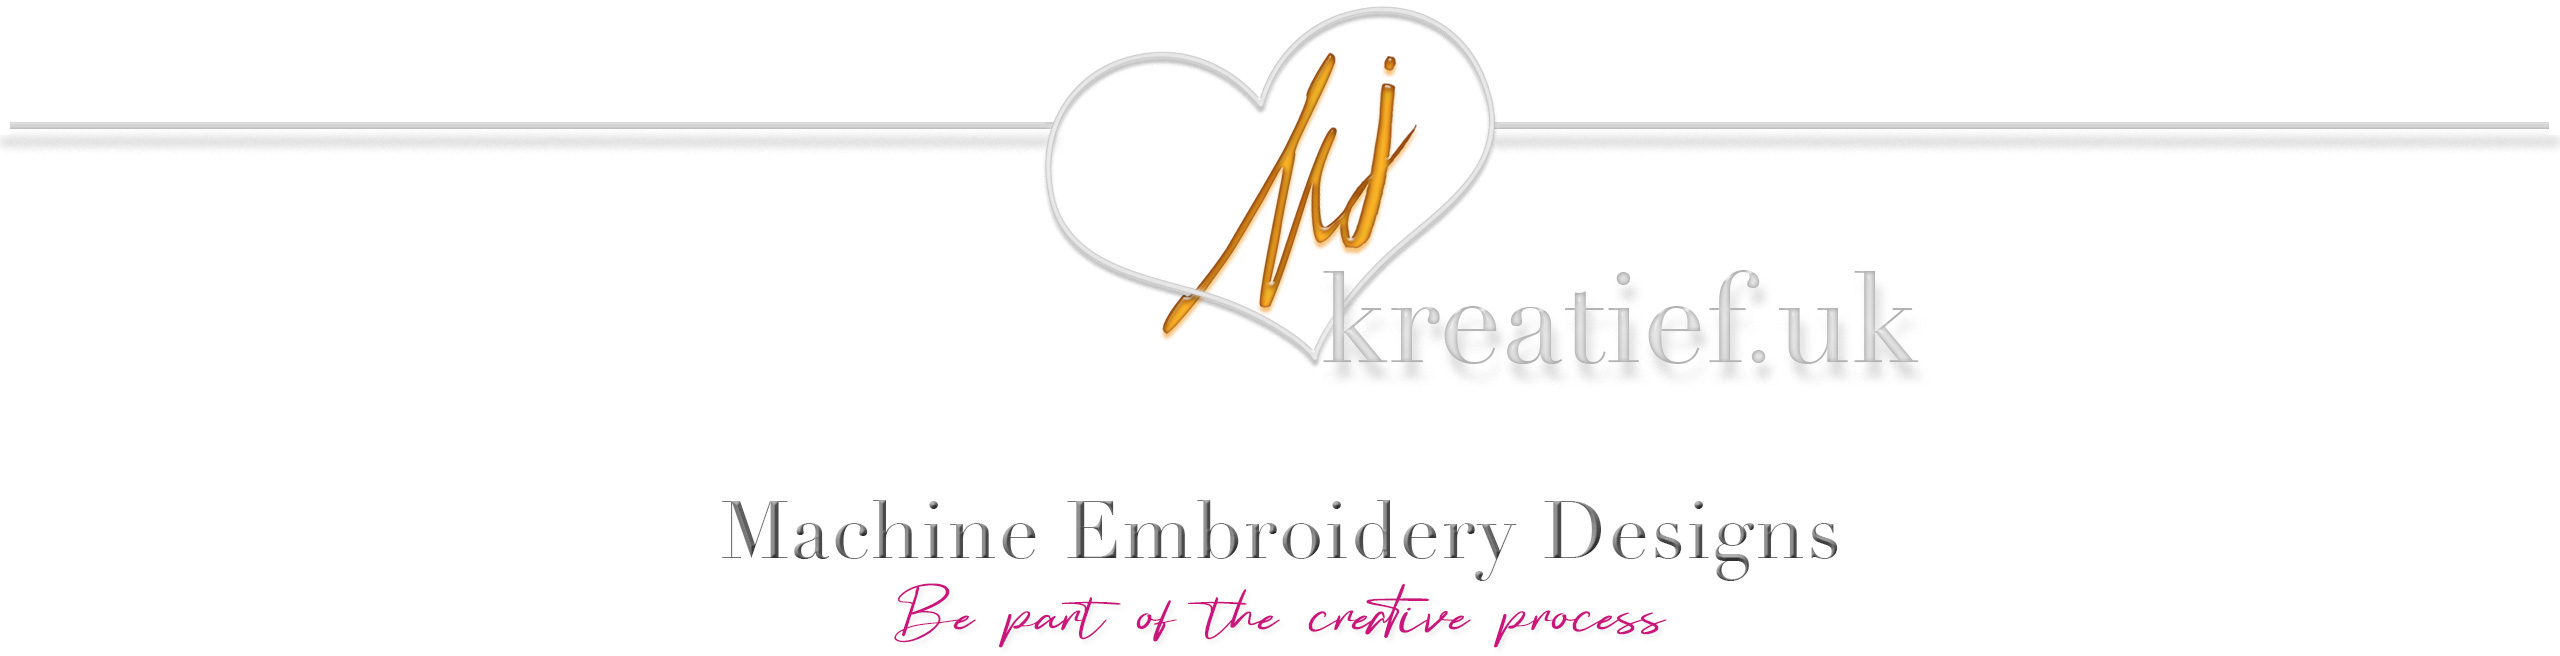 kreatief UK Machine Embroidery Designs